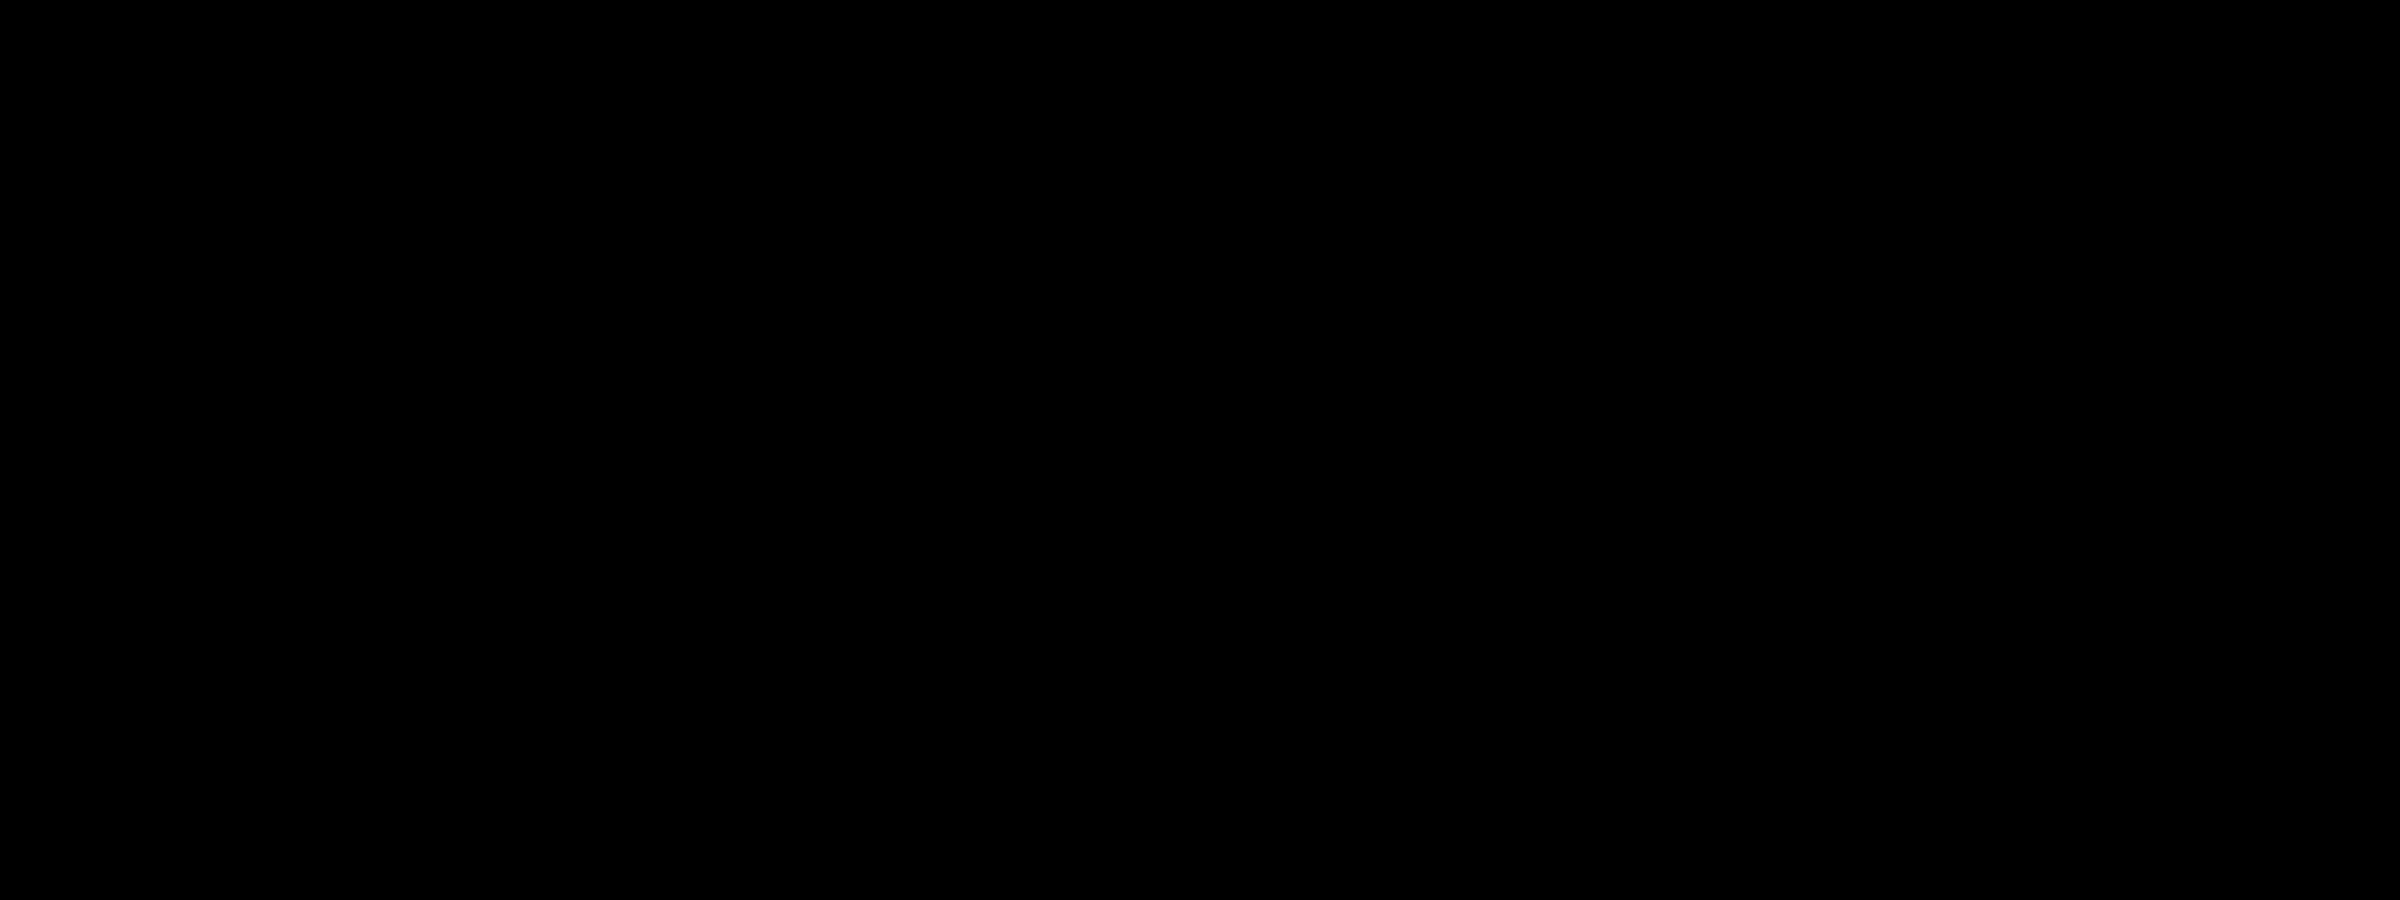 2400x900 Blank Banner